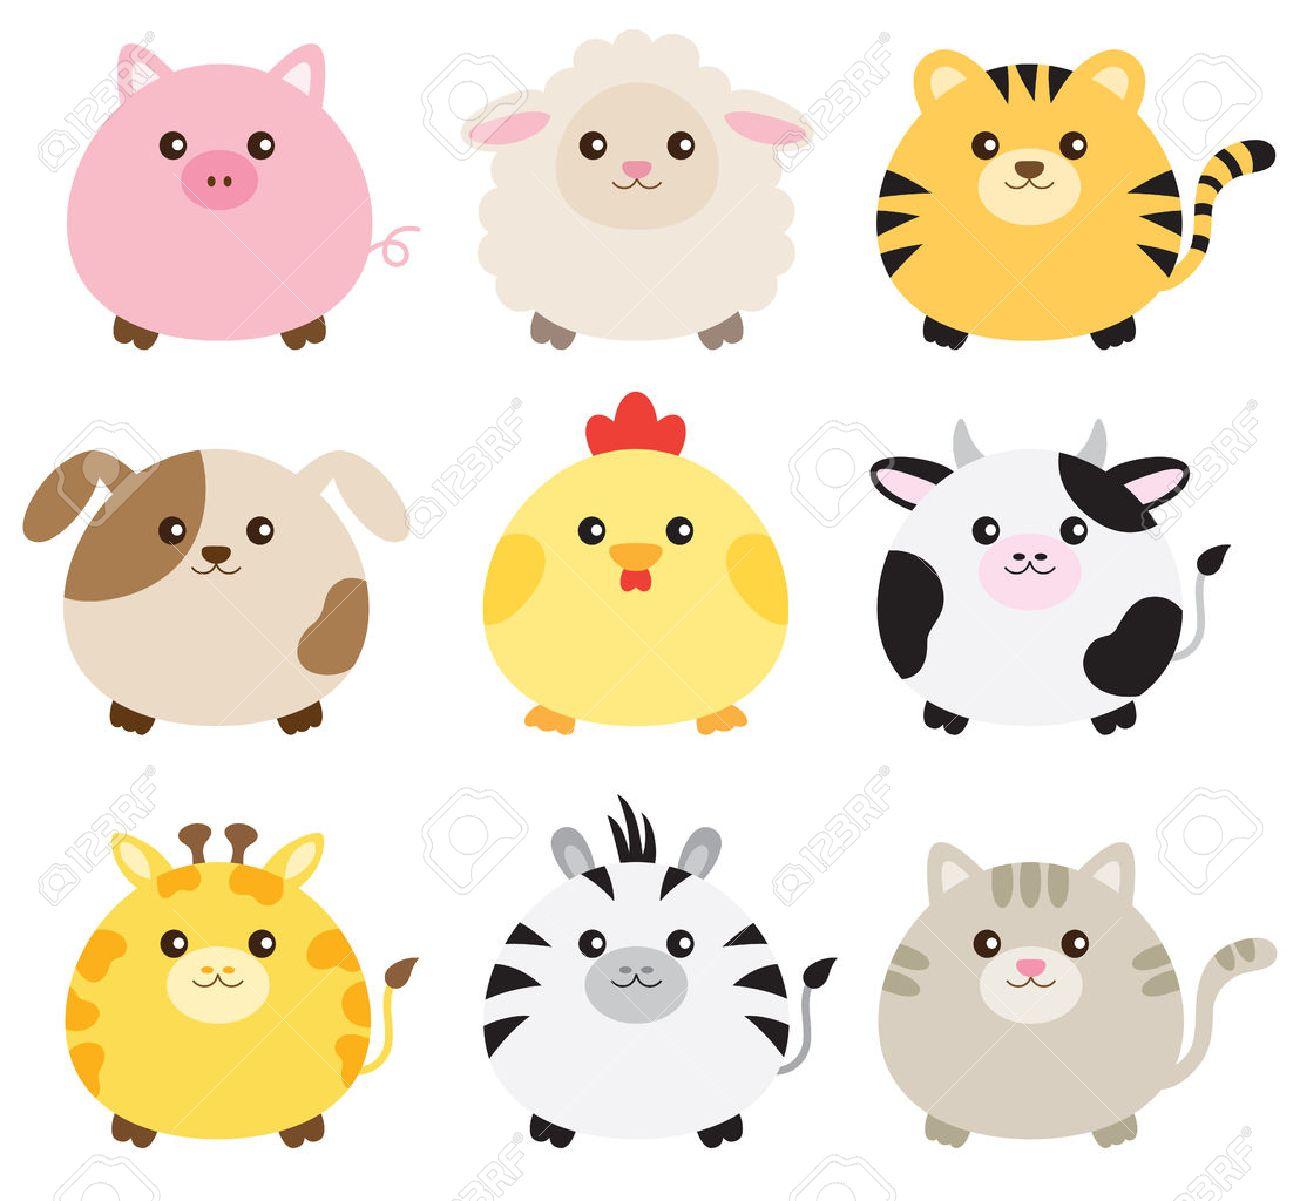 illustration of animals including pig, sheep, tiger, dog, chicken, cow, giraffe, zebra and cat. - 51331478